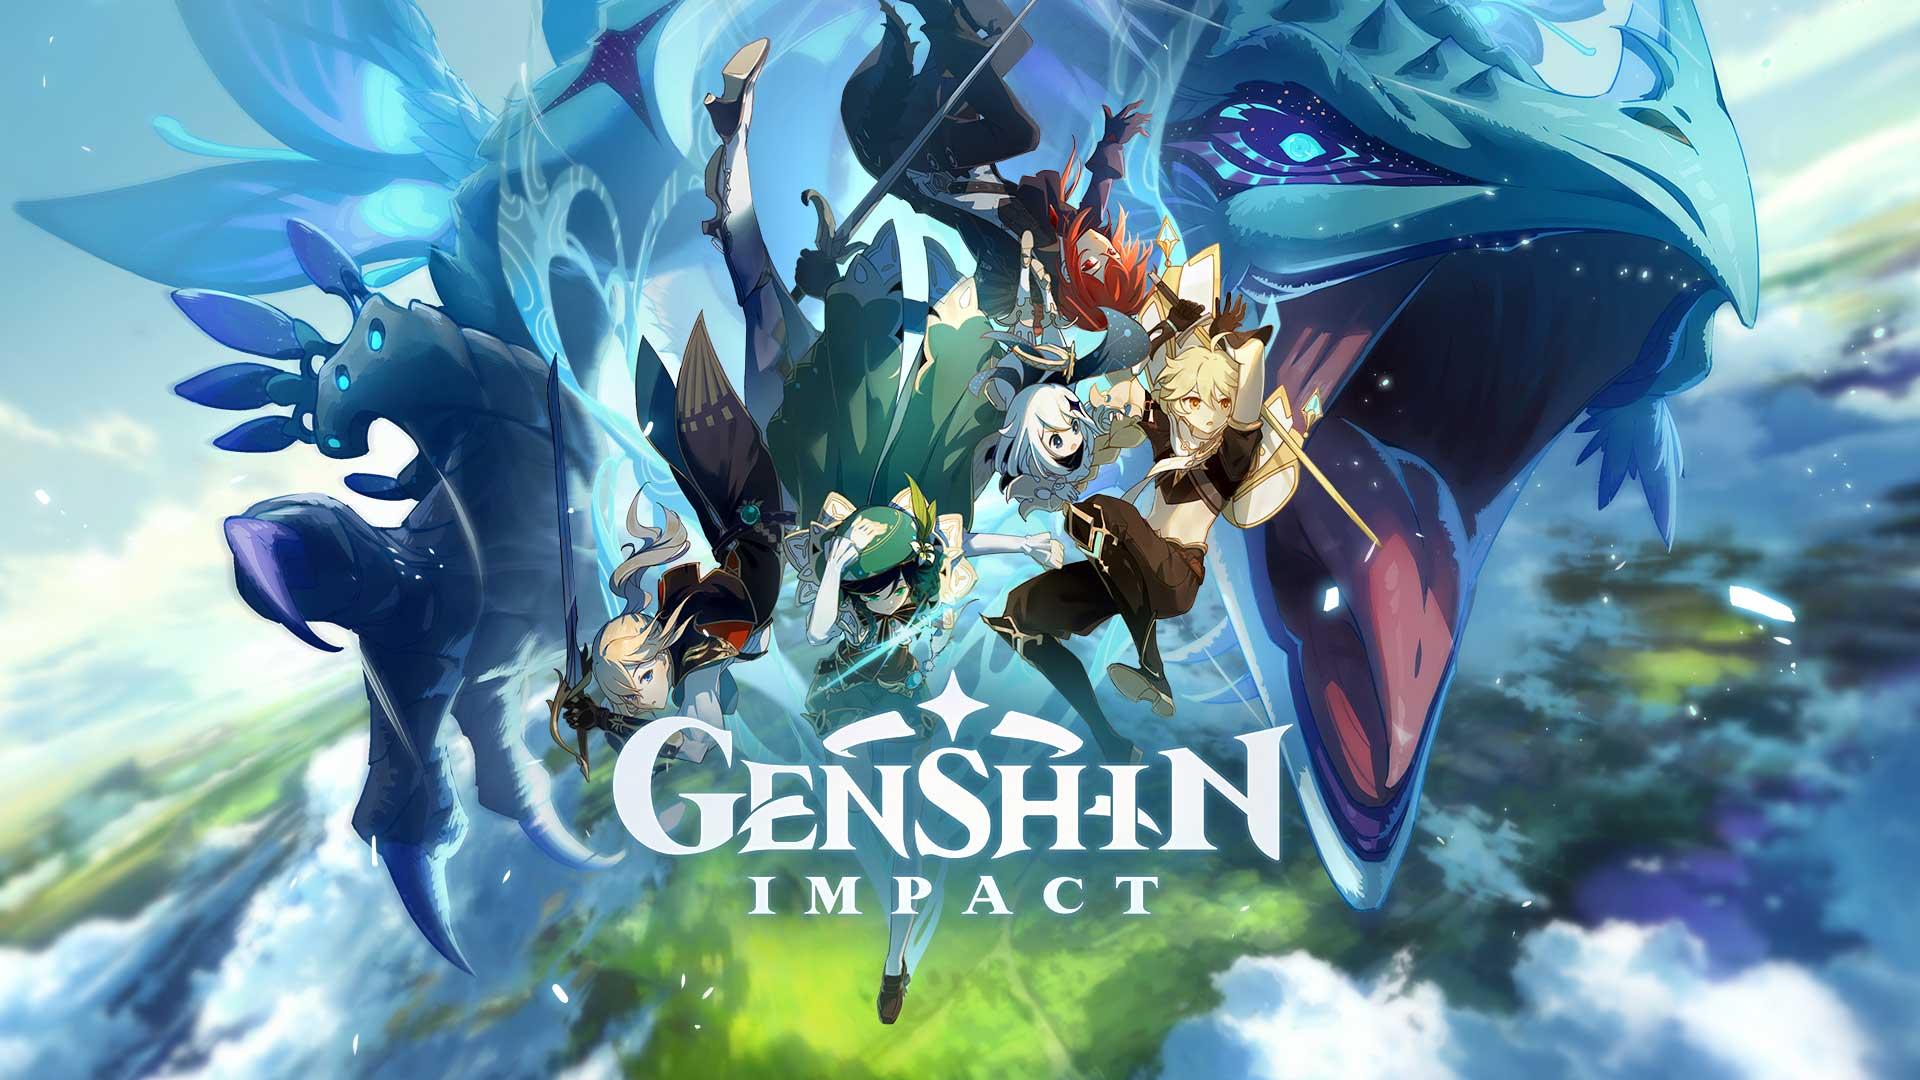 genshin-impact-cover.jpg